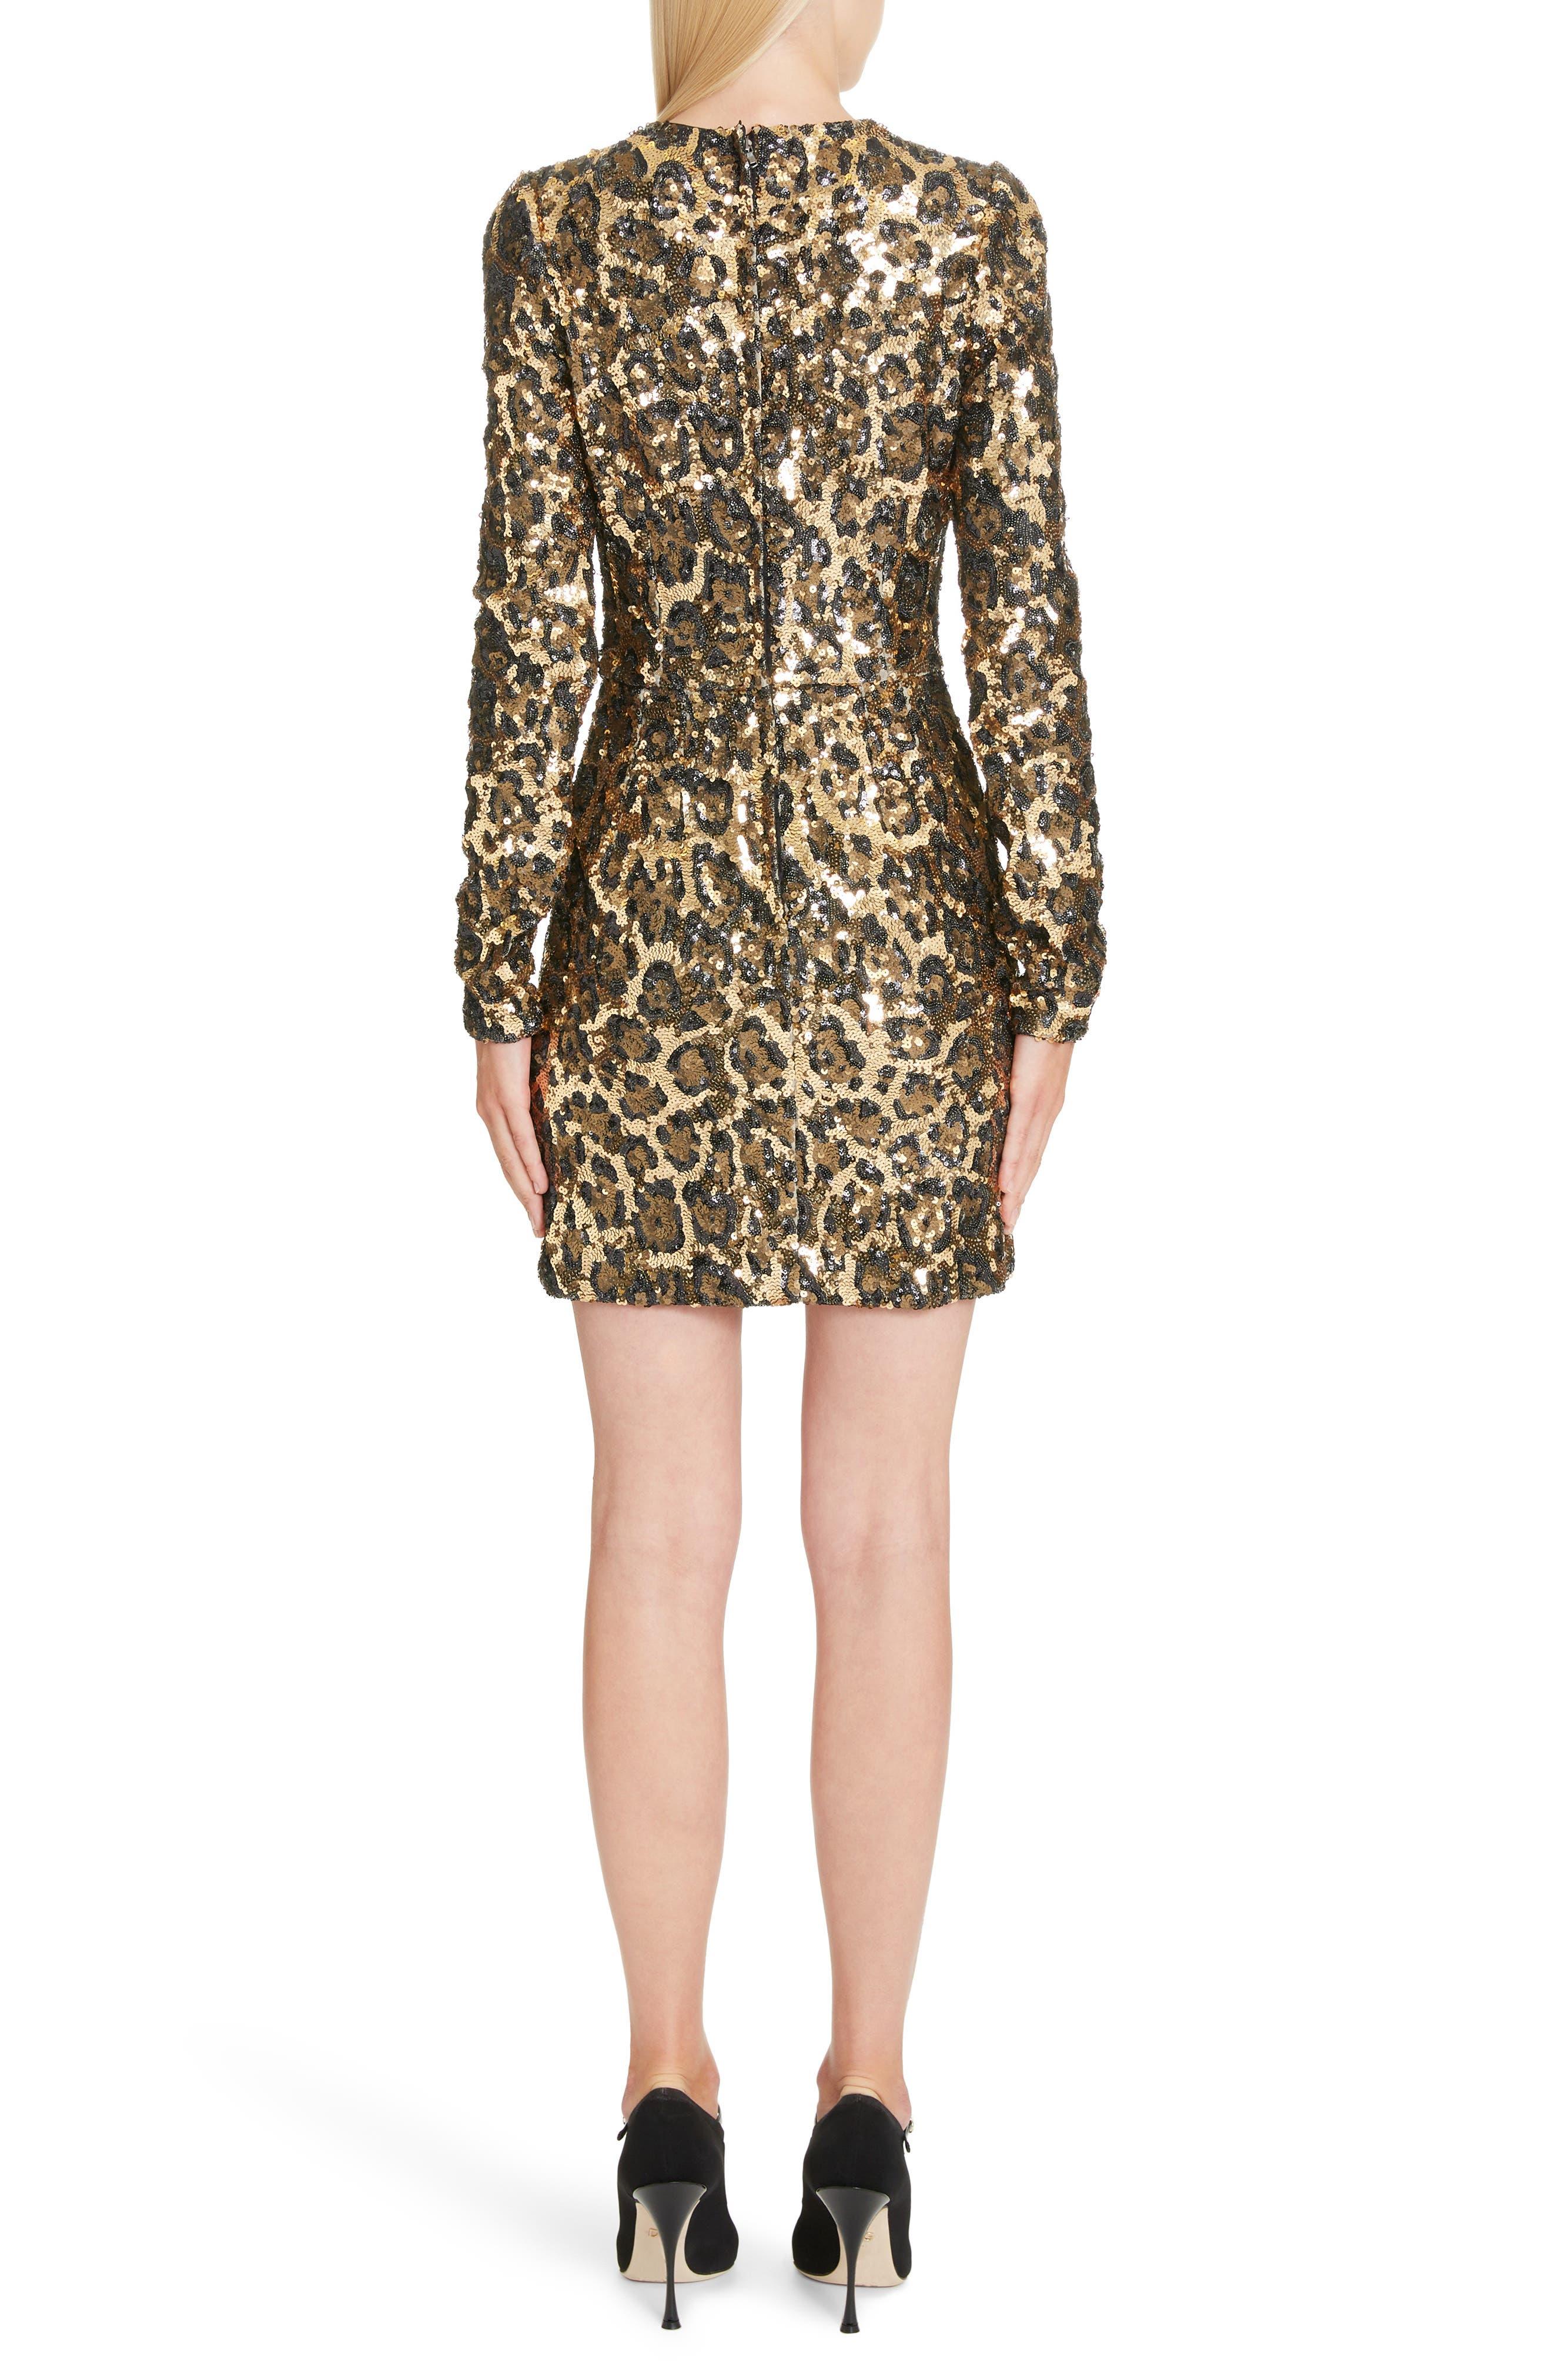 Sequin Leopard Print Sheath Dress,                             Alternate thumbnail 2, color,                             S0905 LEO